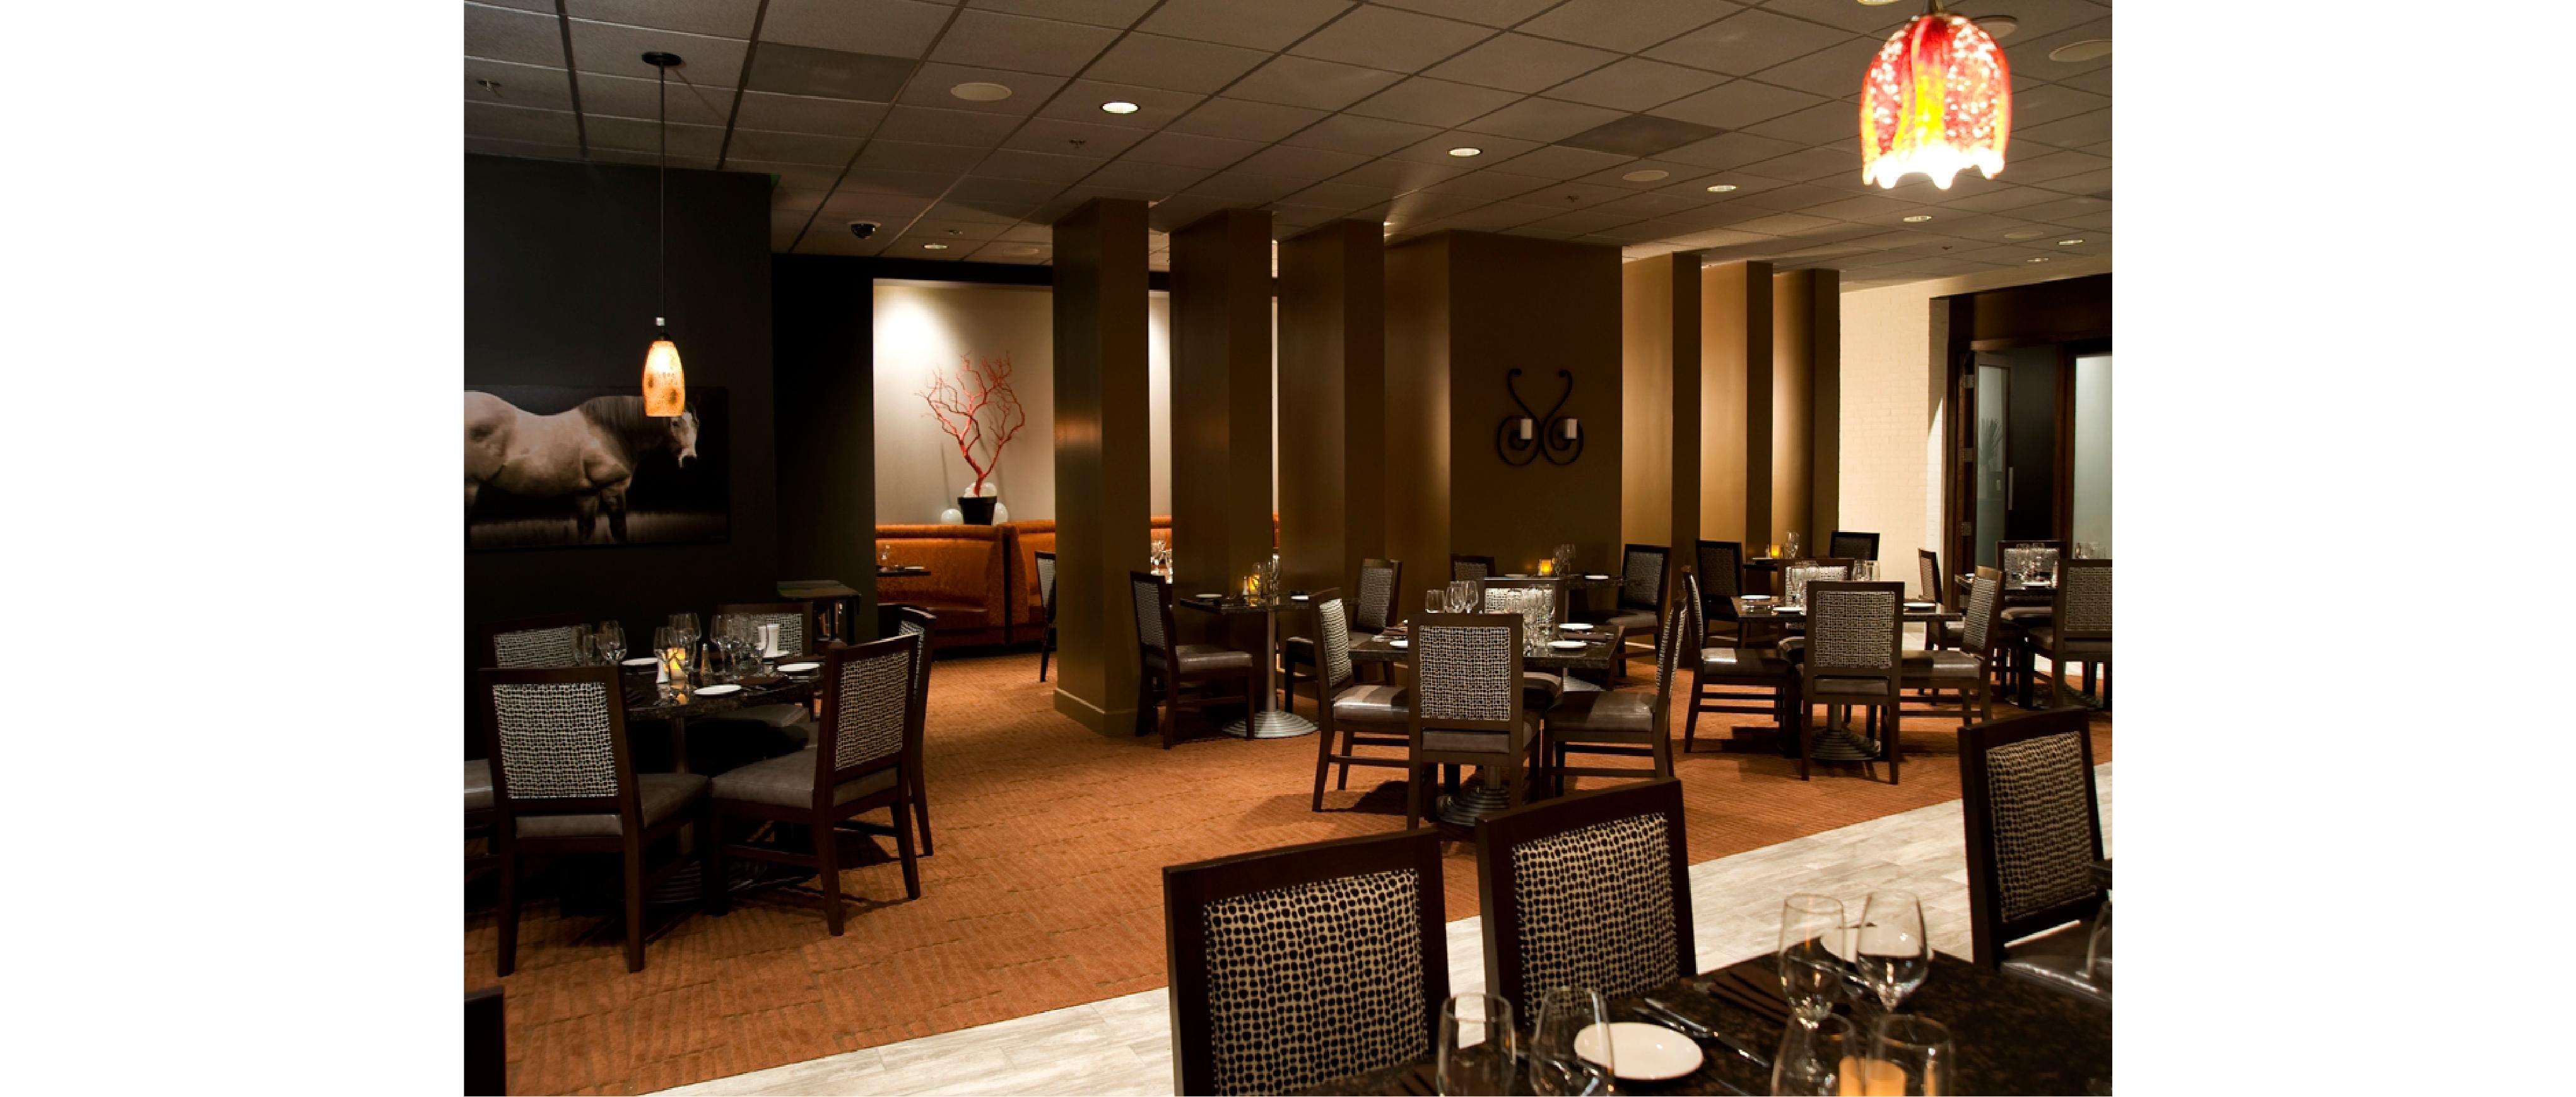 Ron's Steakhouse